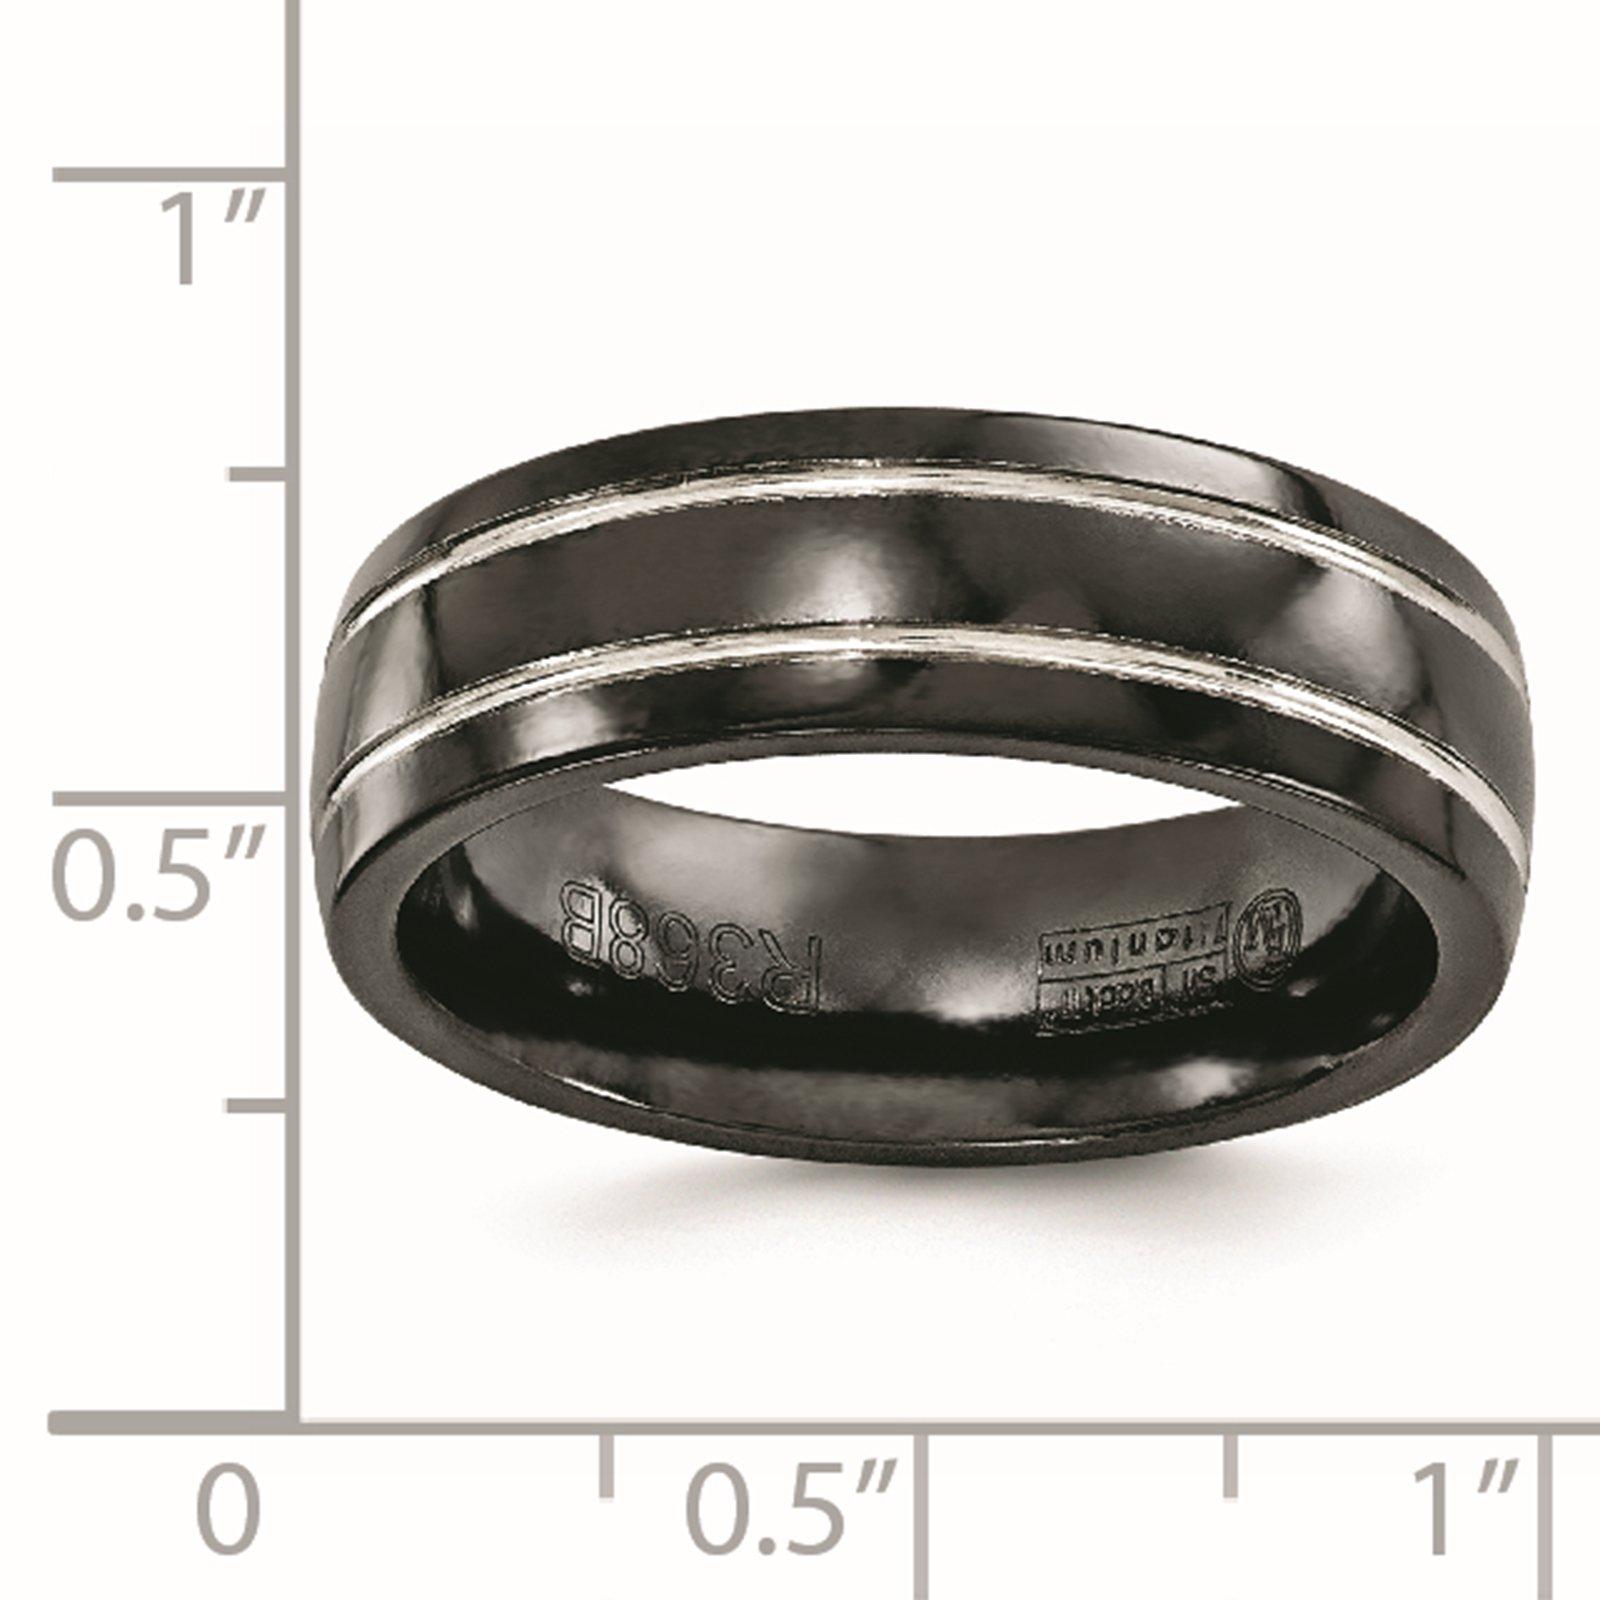 Titanium Black Ti & Grey Grooved 7mm Wedding Ring Band Size 8.5 by Edward Mirell by Venture Edward Mirell Titanium Bands (Image #5)